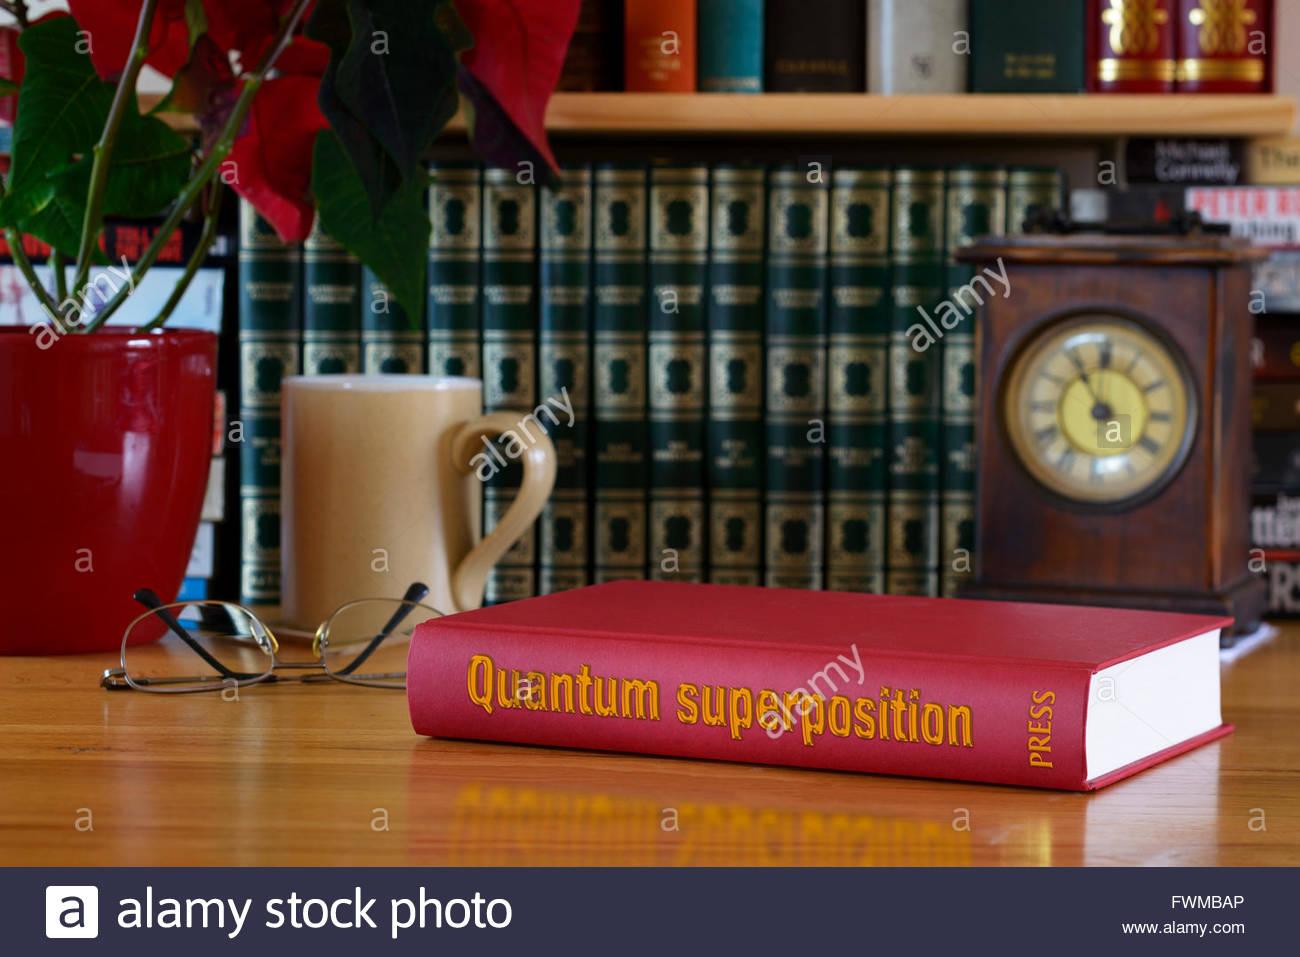 Quantum superposition book title on desk, England - Stock Image